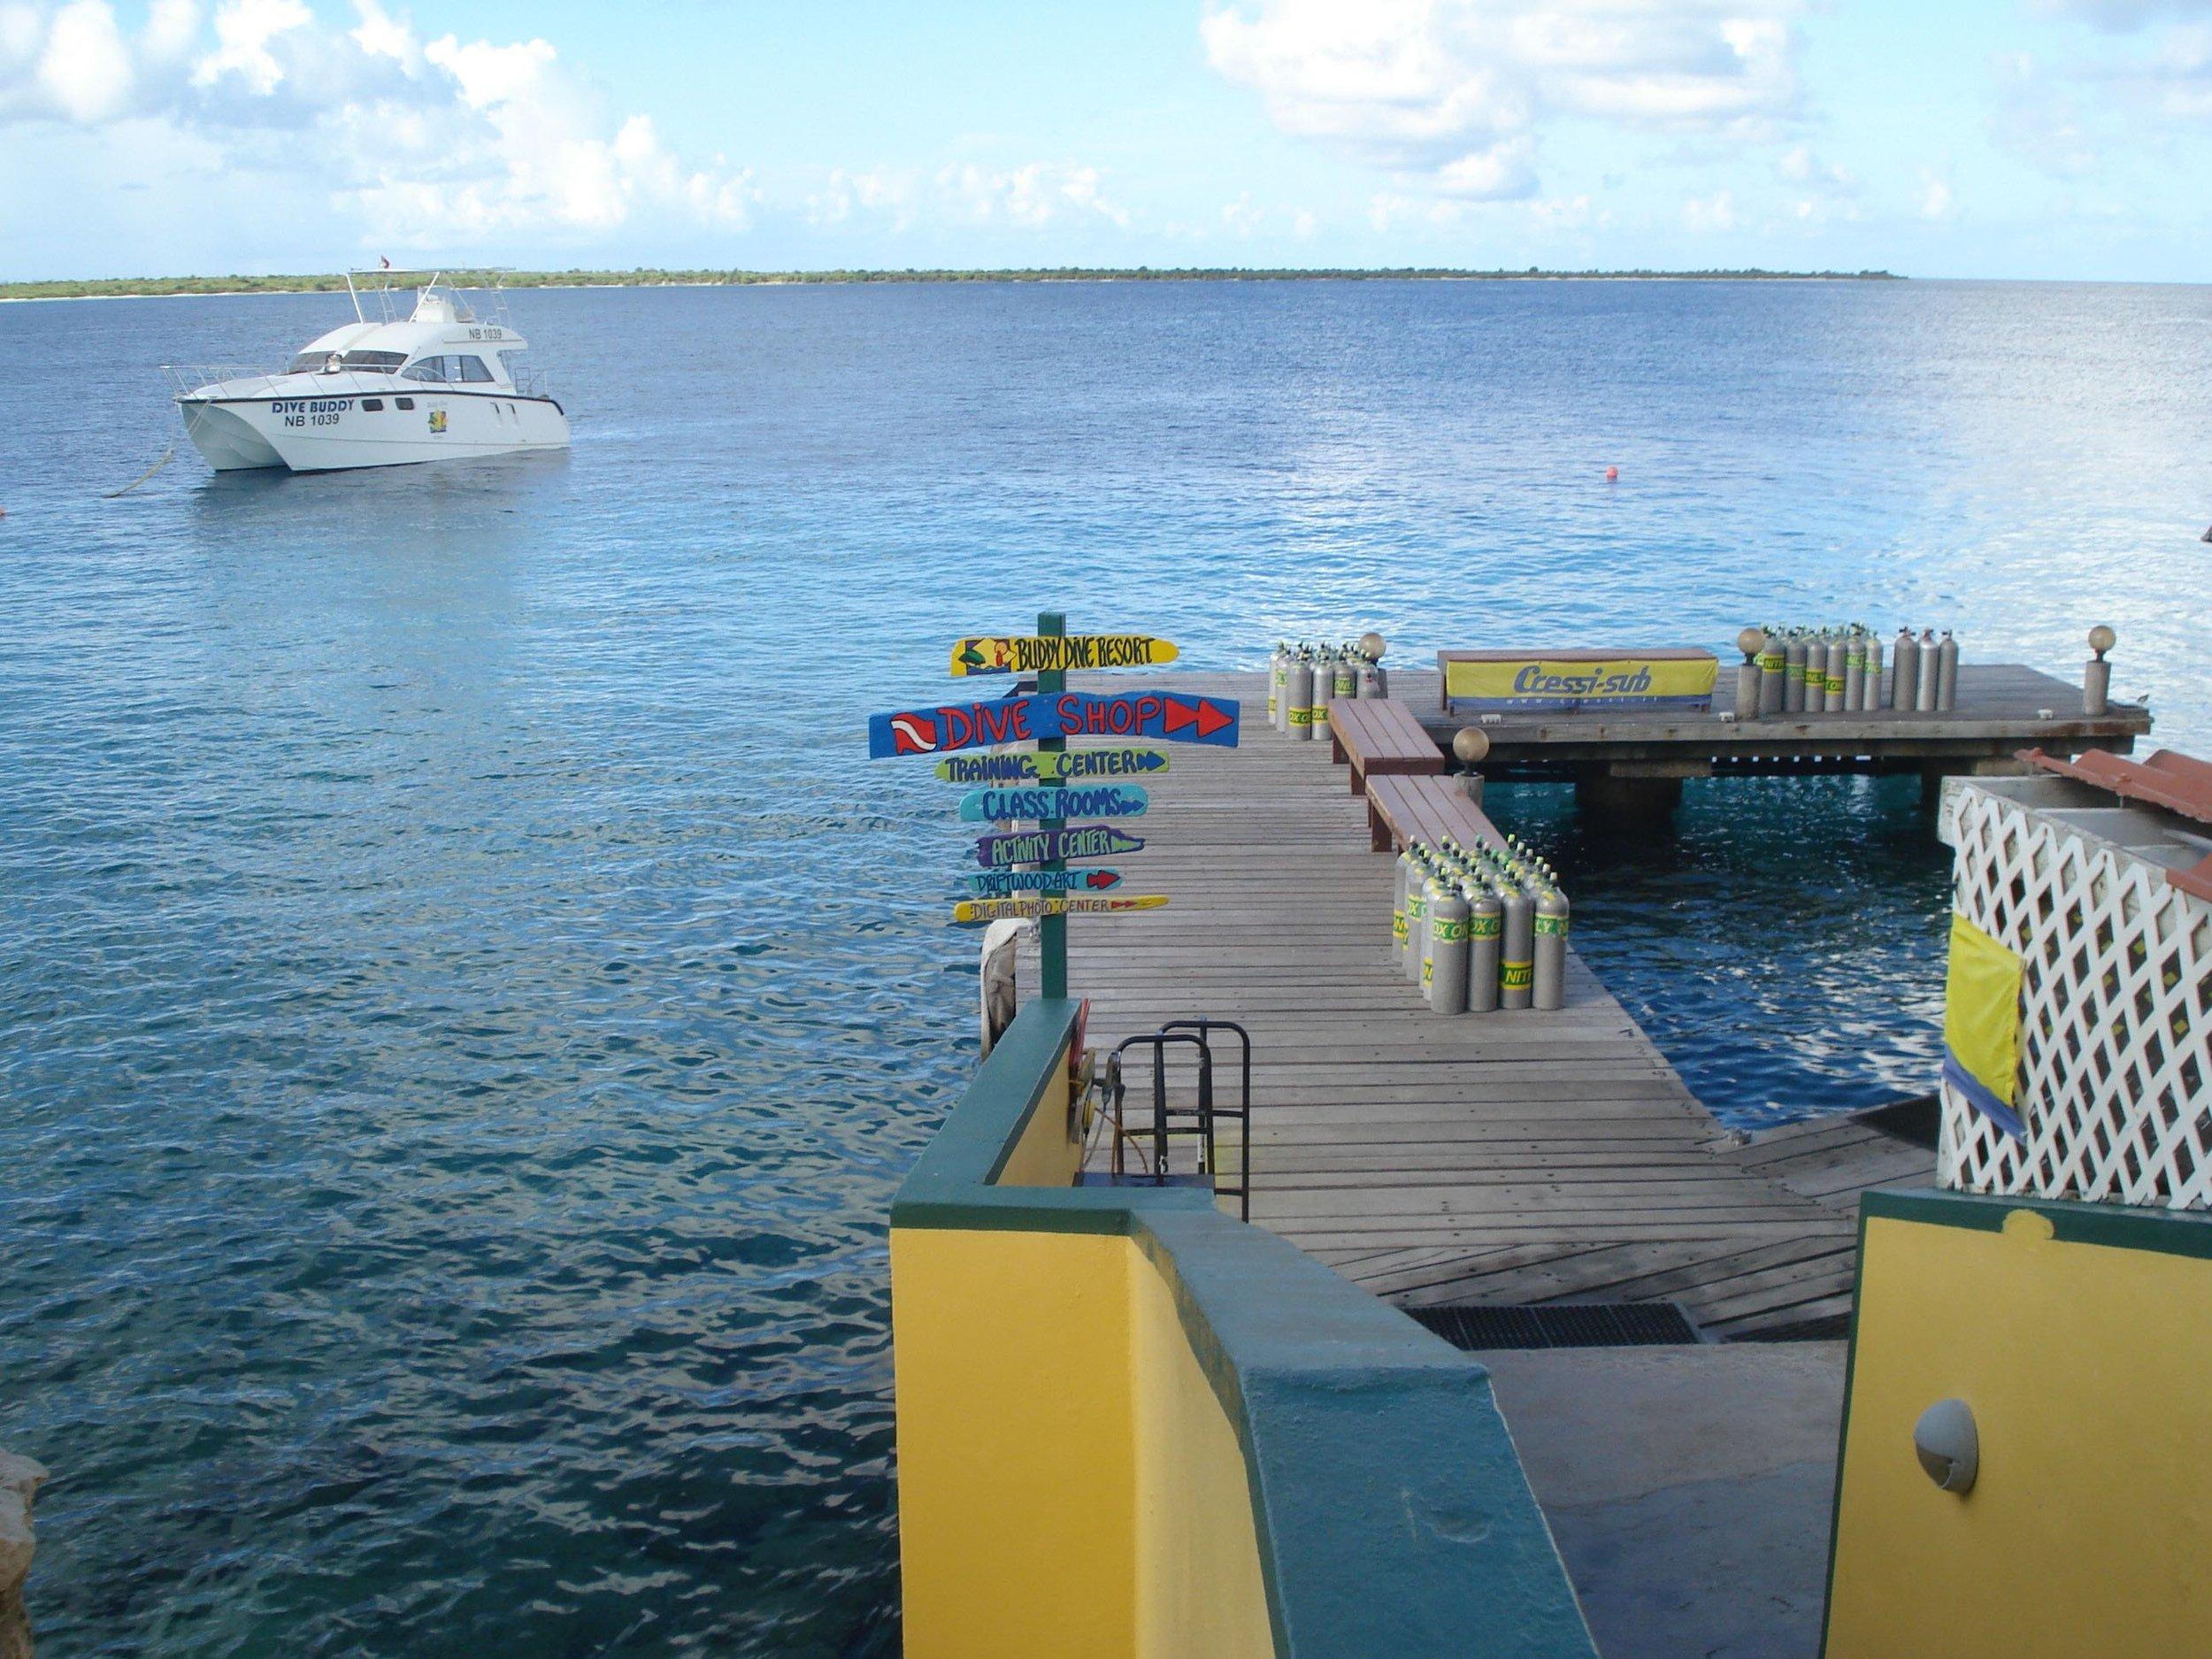 Buddy Dive Resort on Bonaire